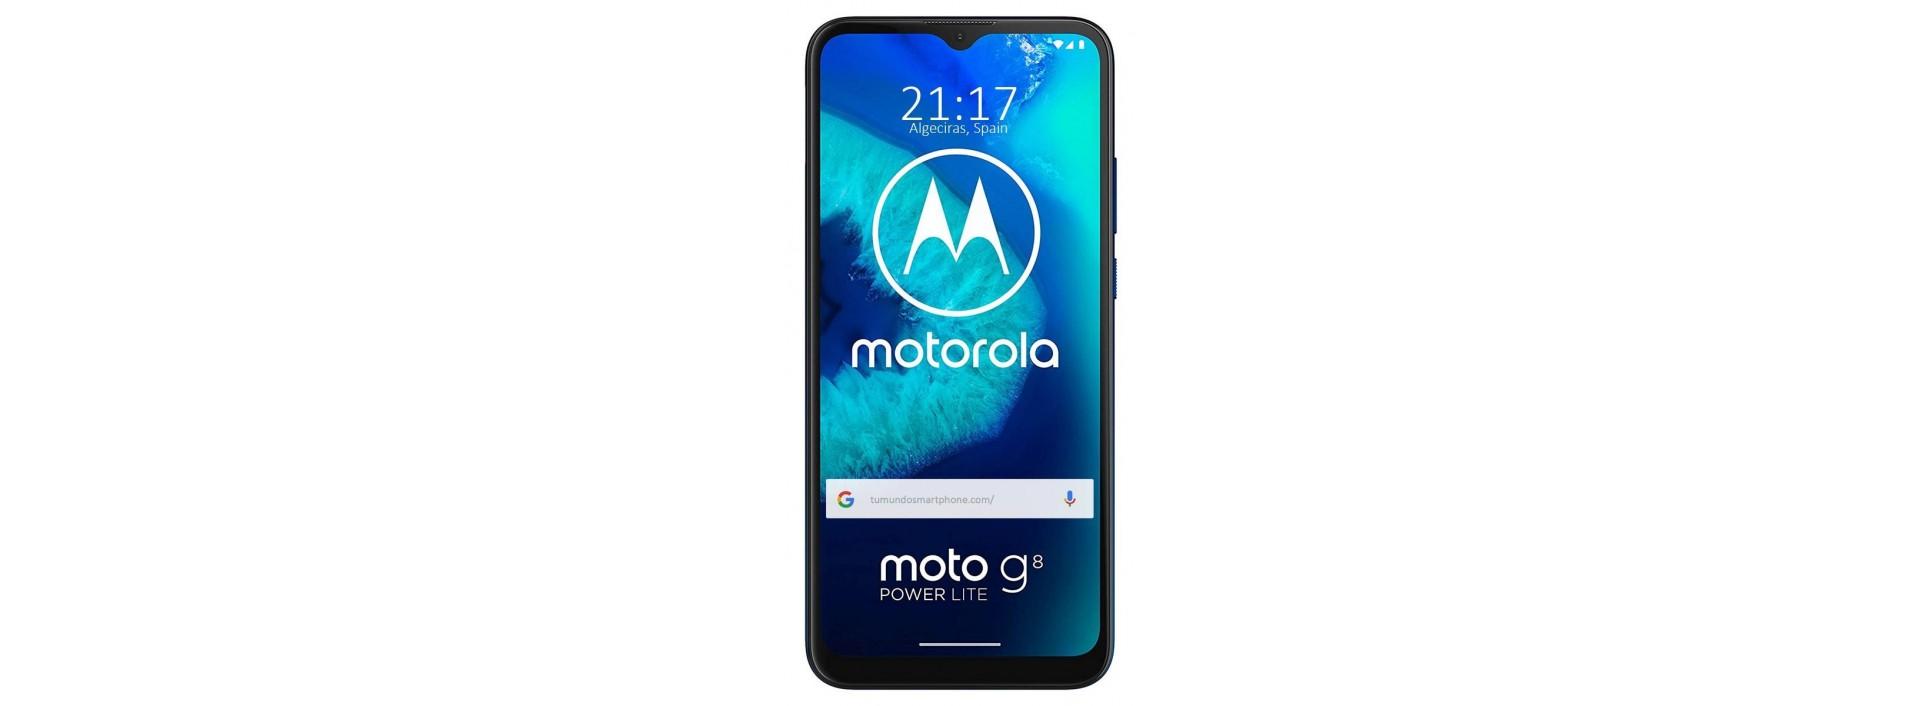 Fundas para Motorola Moto G8 Power Lite